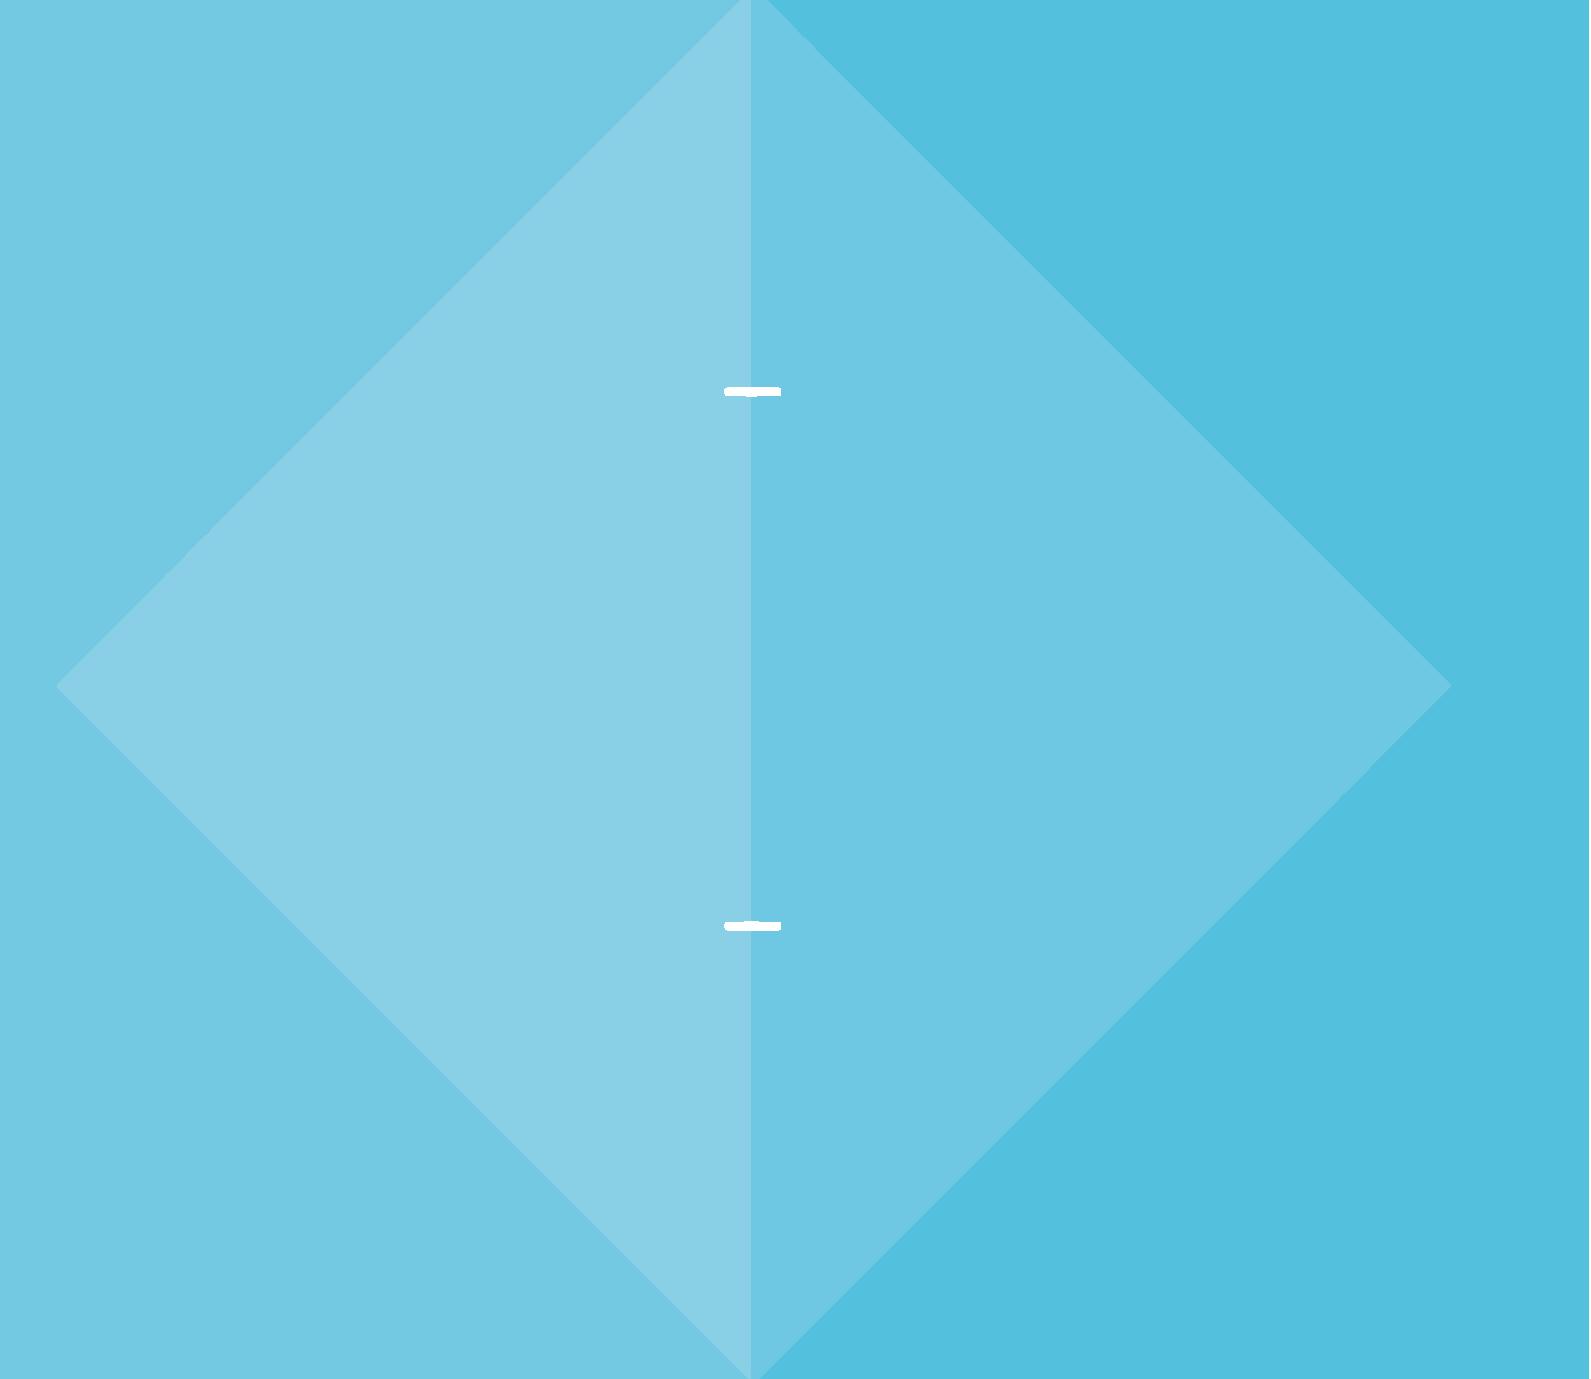 Illustrations de triangles bleus